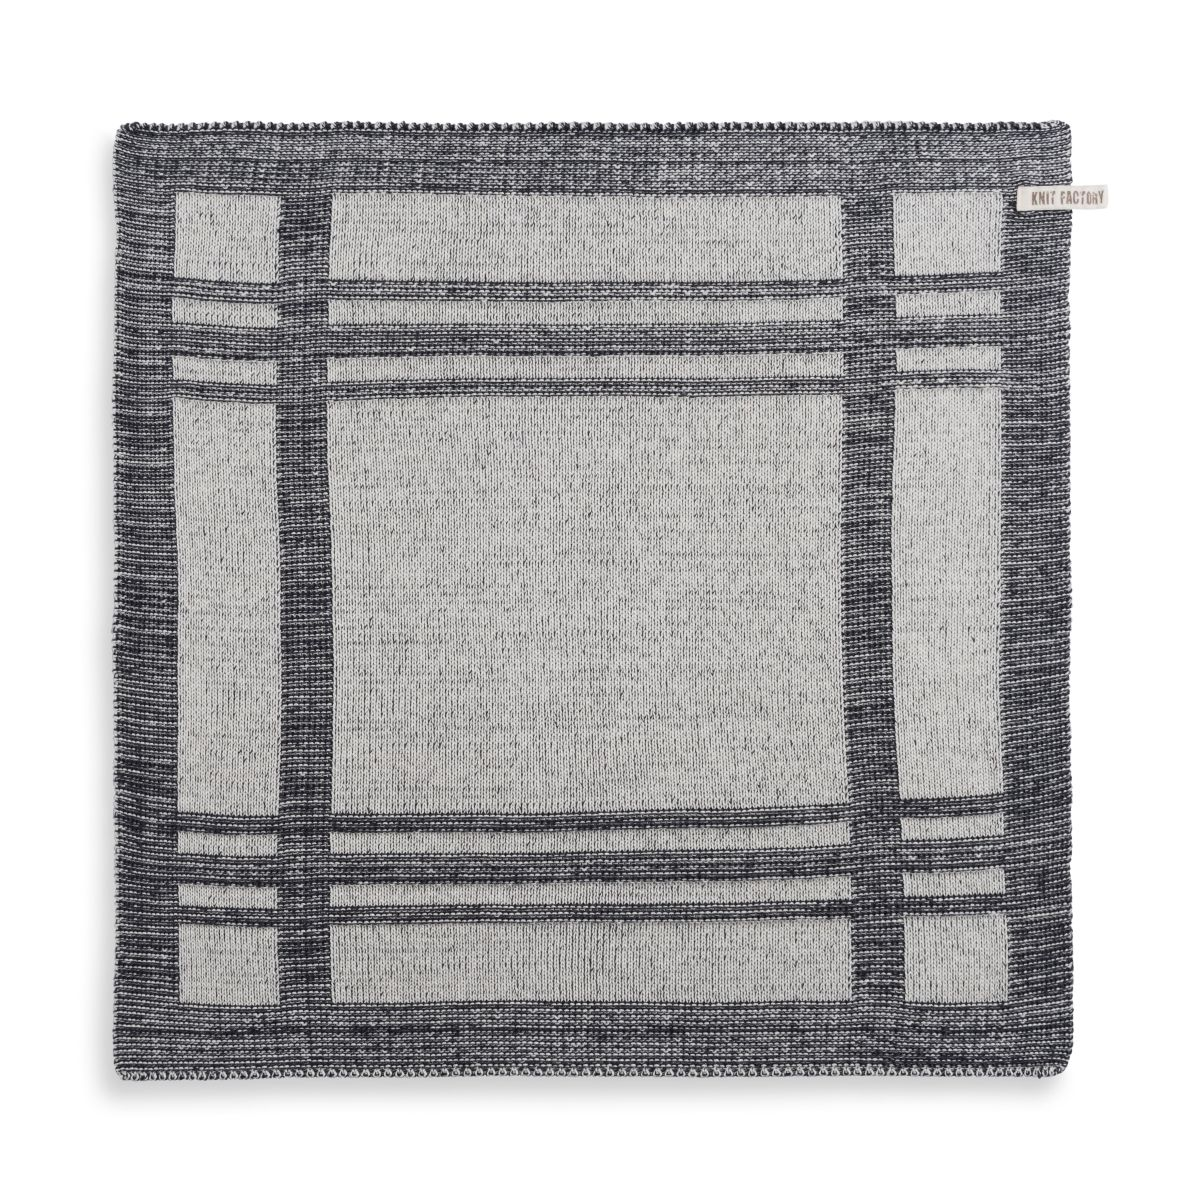 knit factory 2160070 keukendoek olivia ecru antraciet